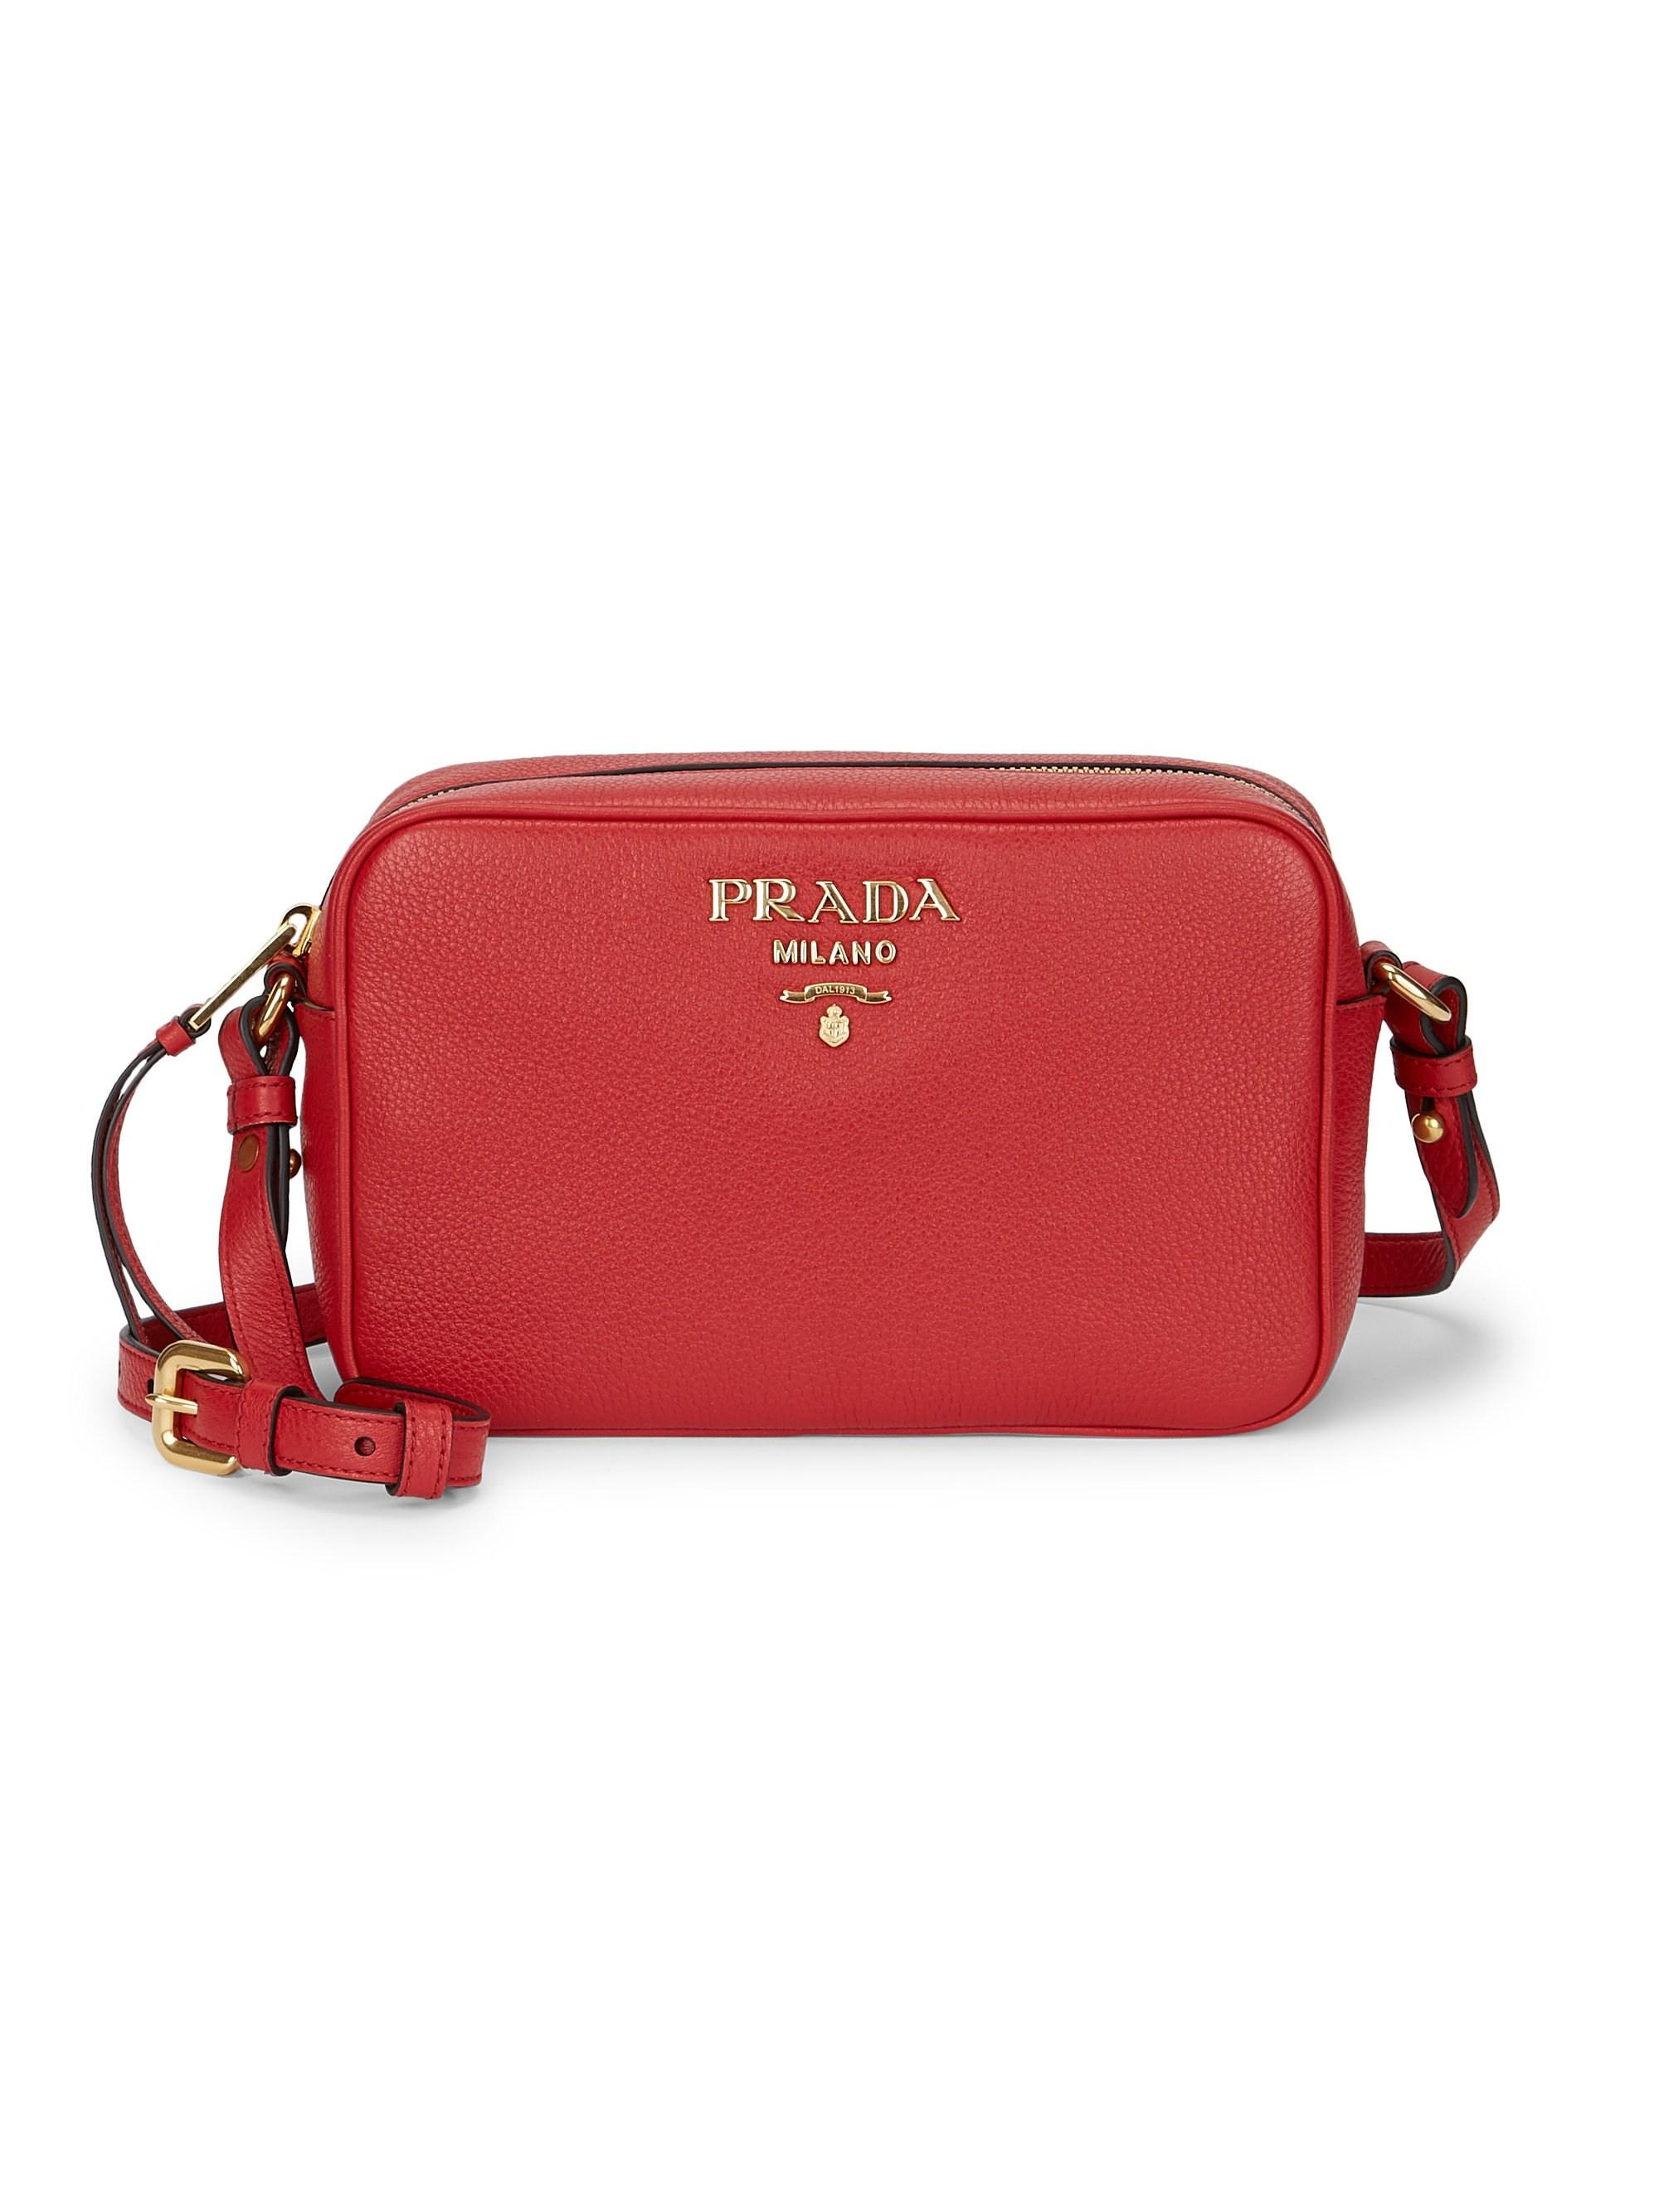 ebf0e7844391bf Prada - Women's Daino Textured Leather Mini Crossbody Bag - Cammeo - Lyst.  View fullscreen